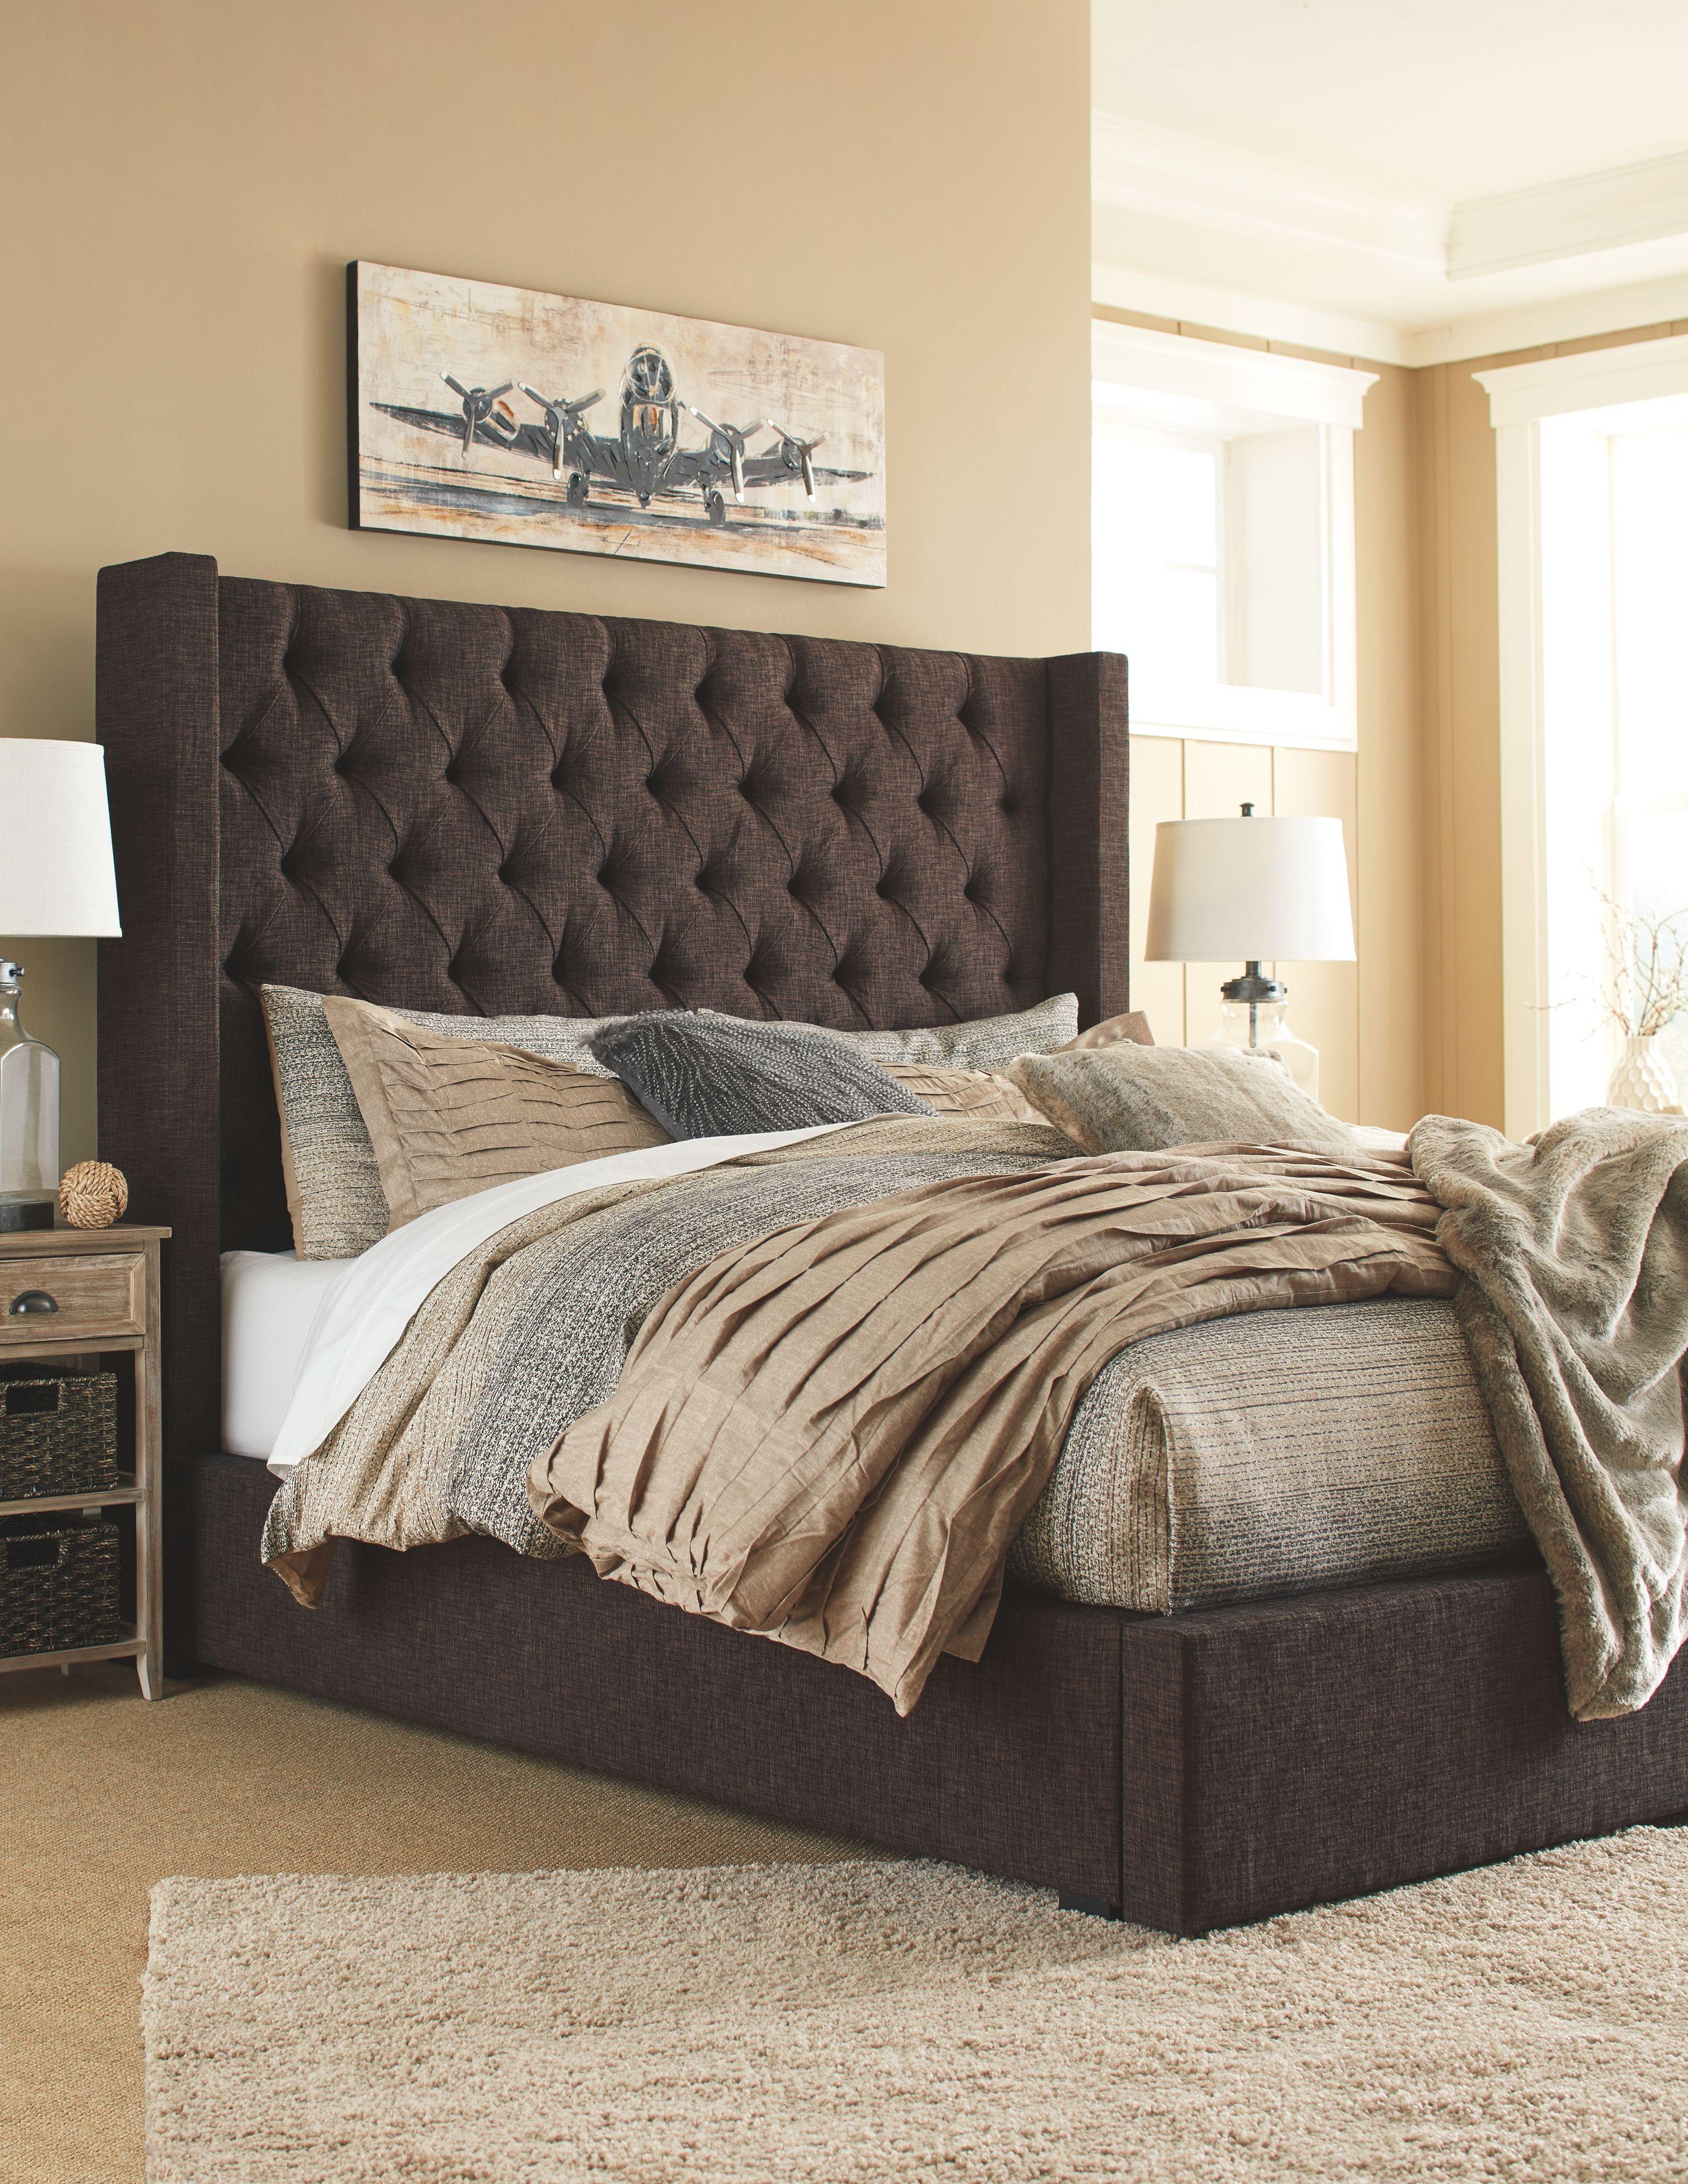 Norrister King Upholstered Bed Ashley Furniture Homestore King Upholstered Bed Upholstered Beds Brown Headboard Bedroom